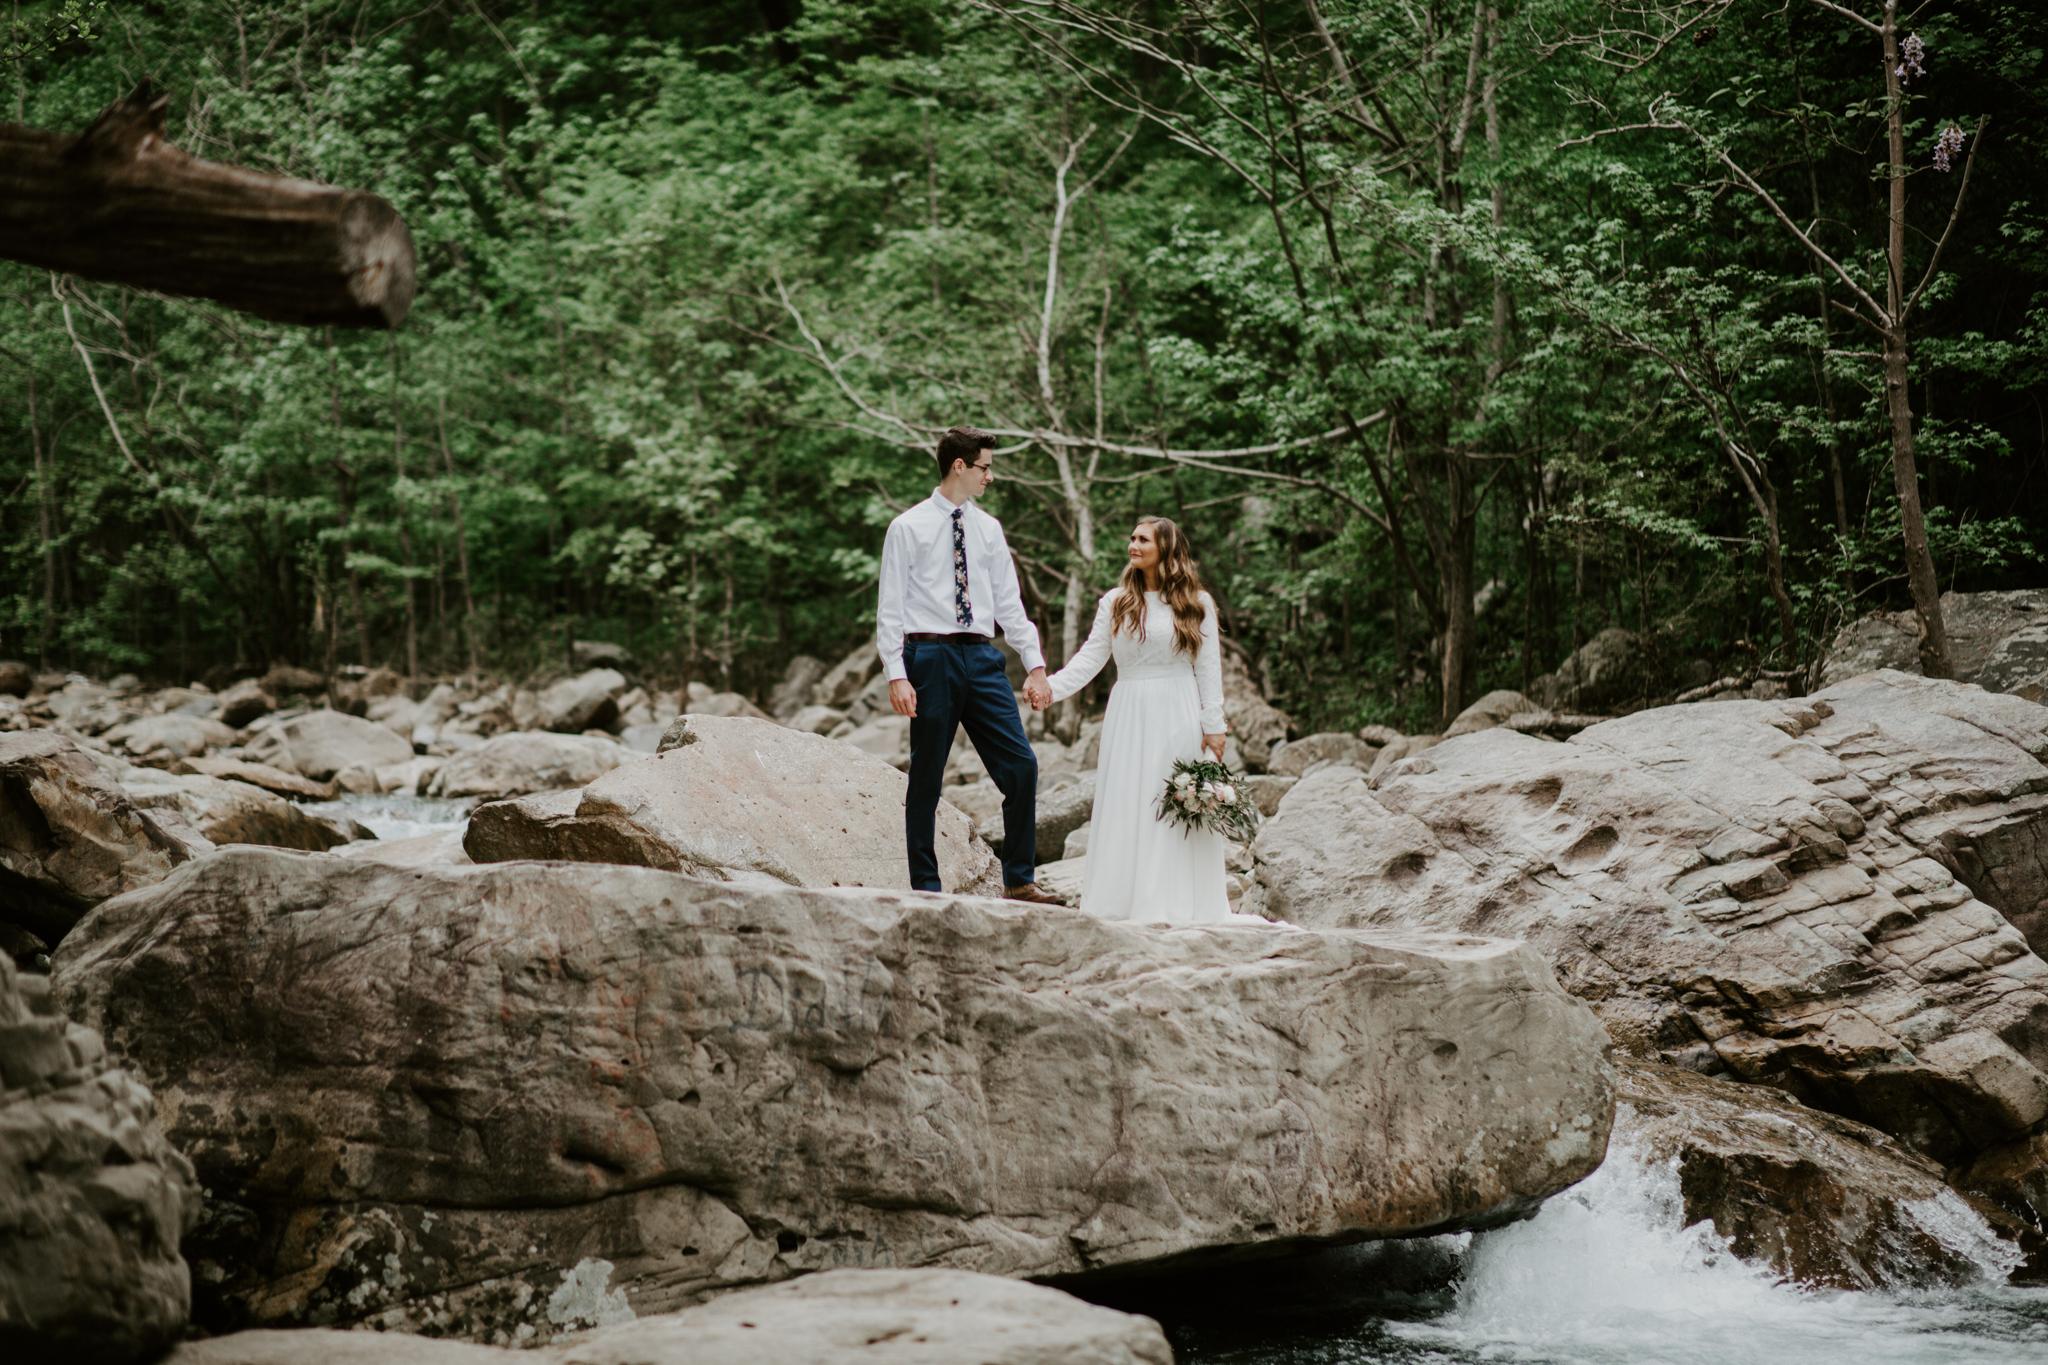 Lacey-Joe-Chattanooga-Nashville-Tennessee-Wedding-Elopement-Photographer-207.jpg